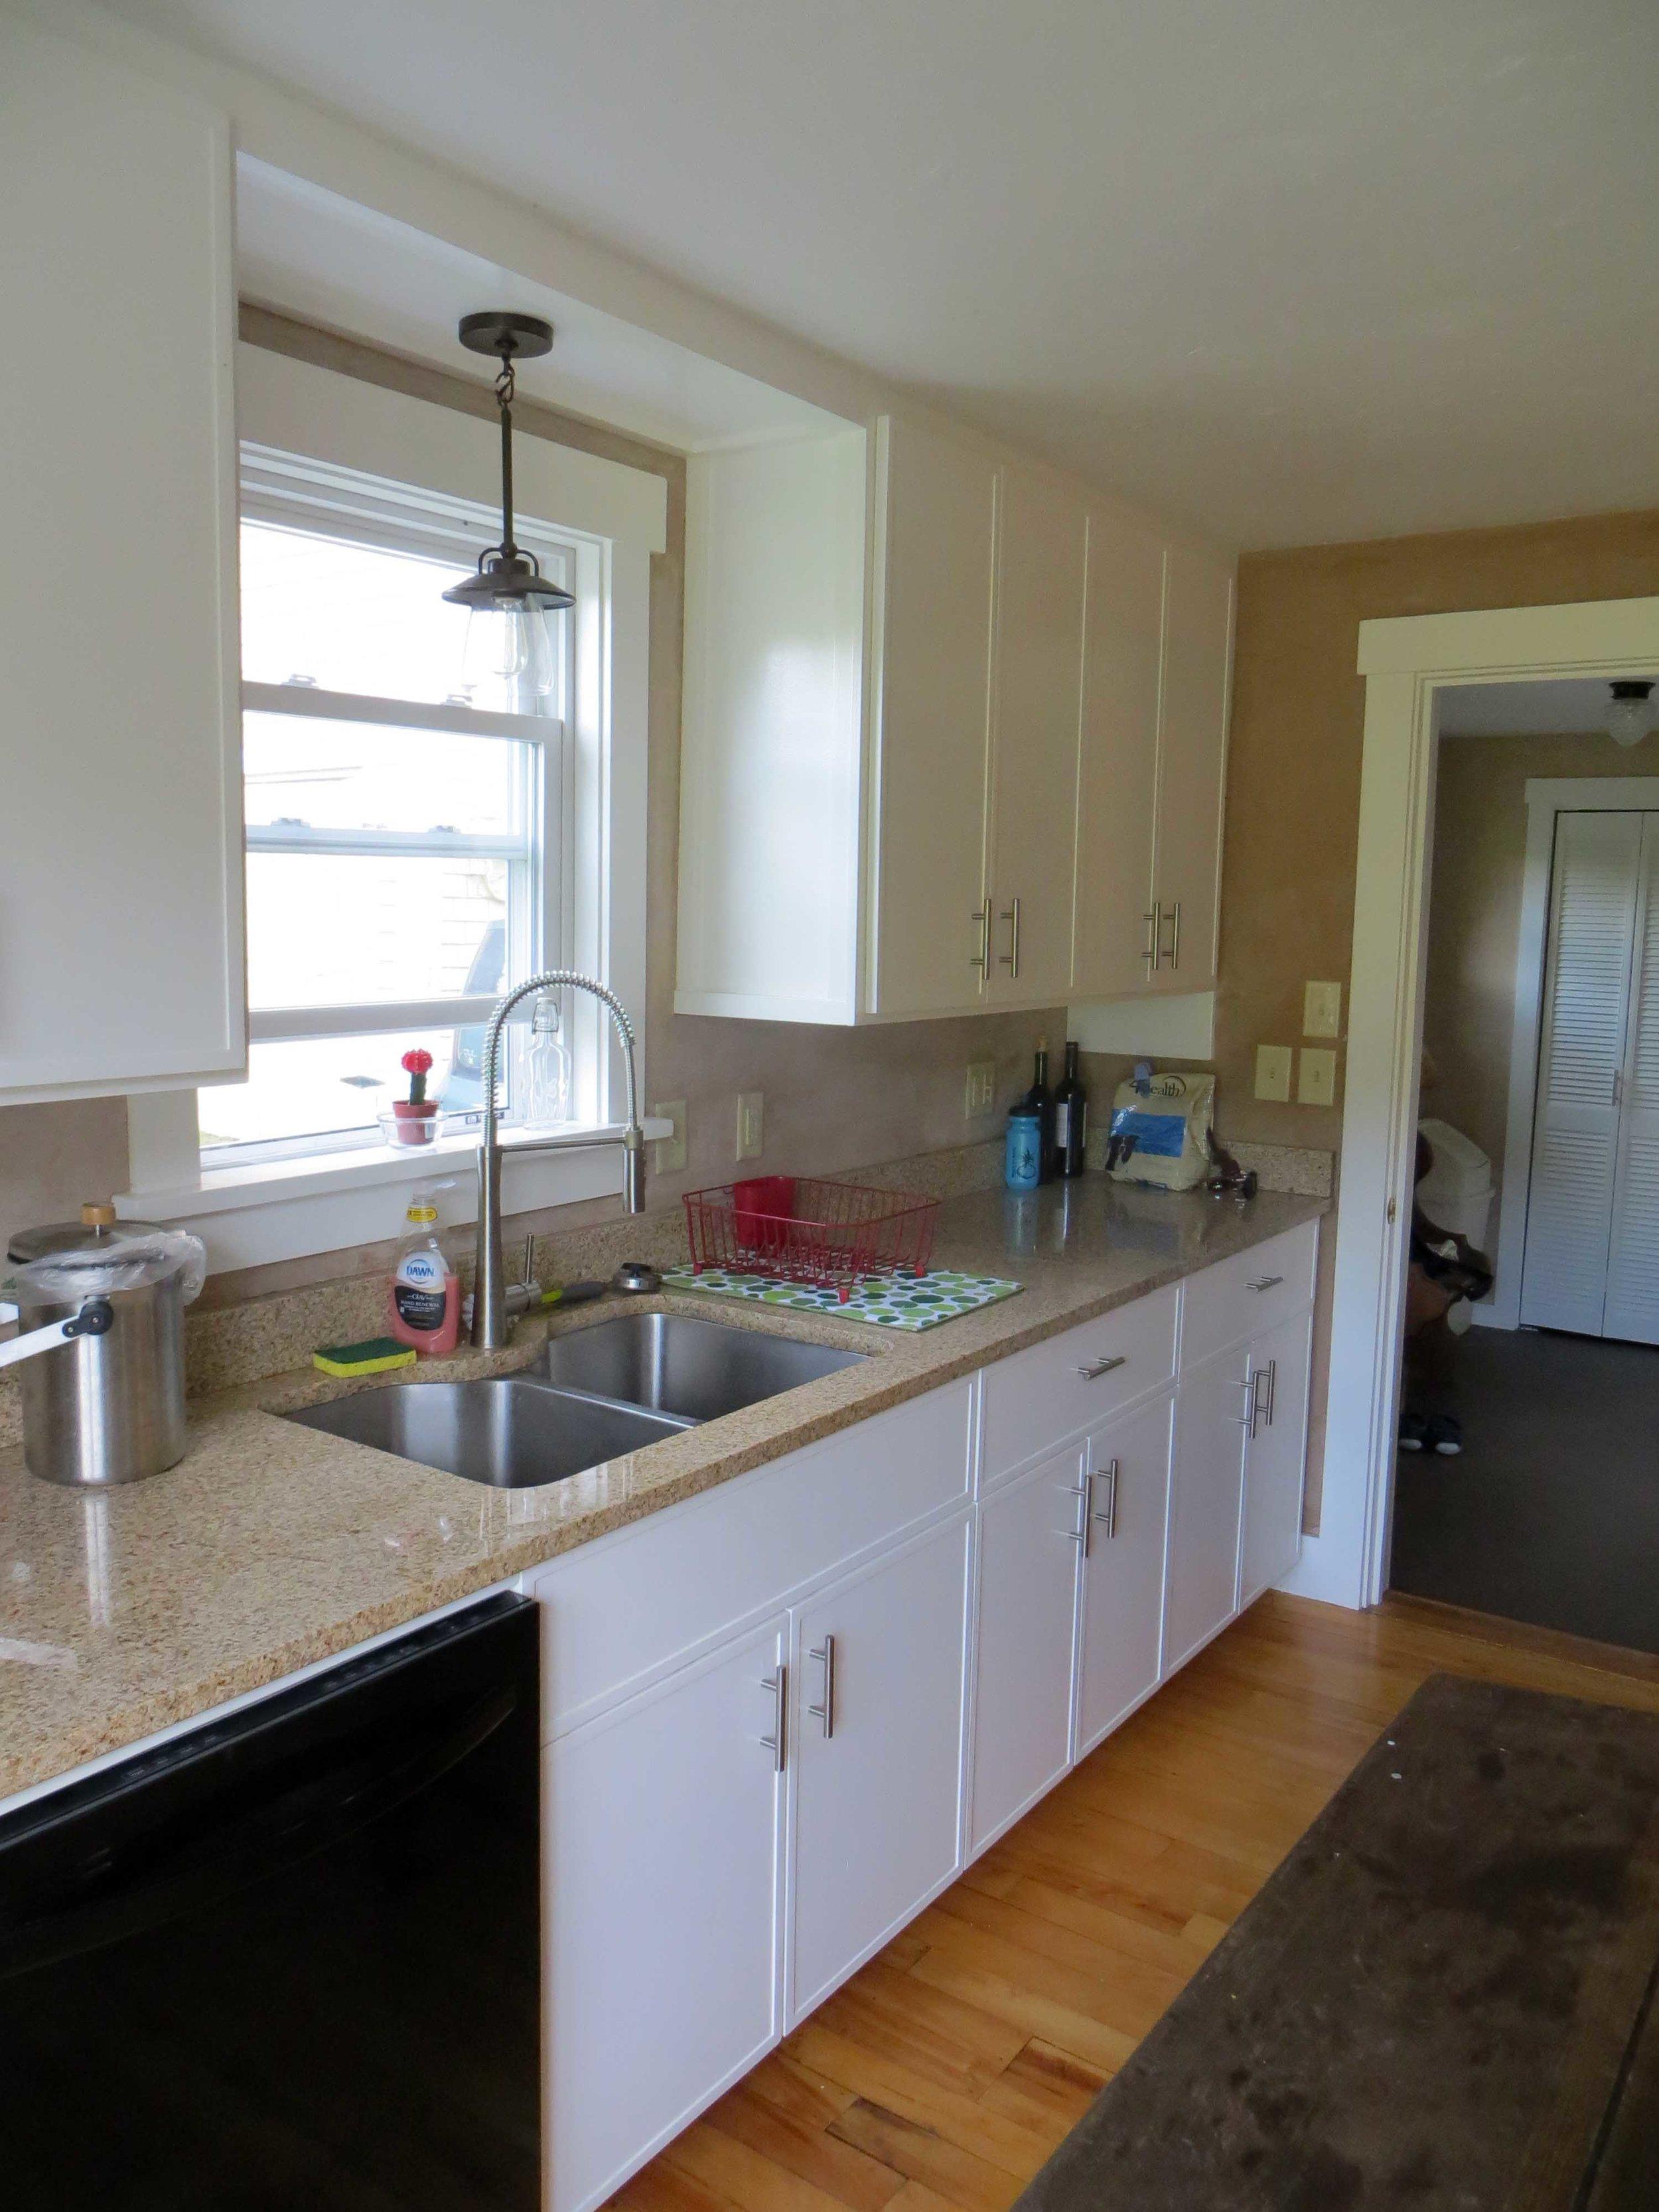 Overton_lo res_Kitchen sink area.jpg